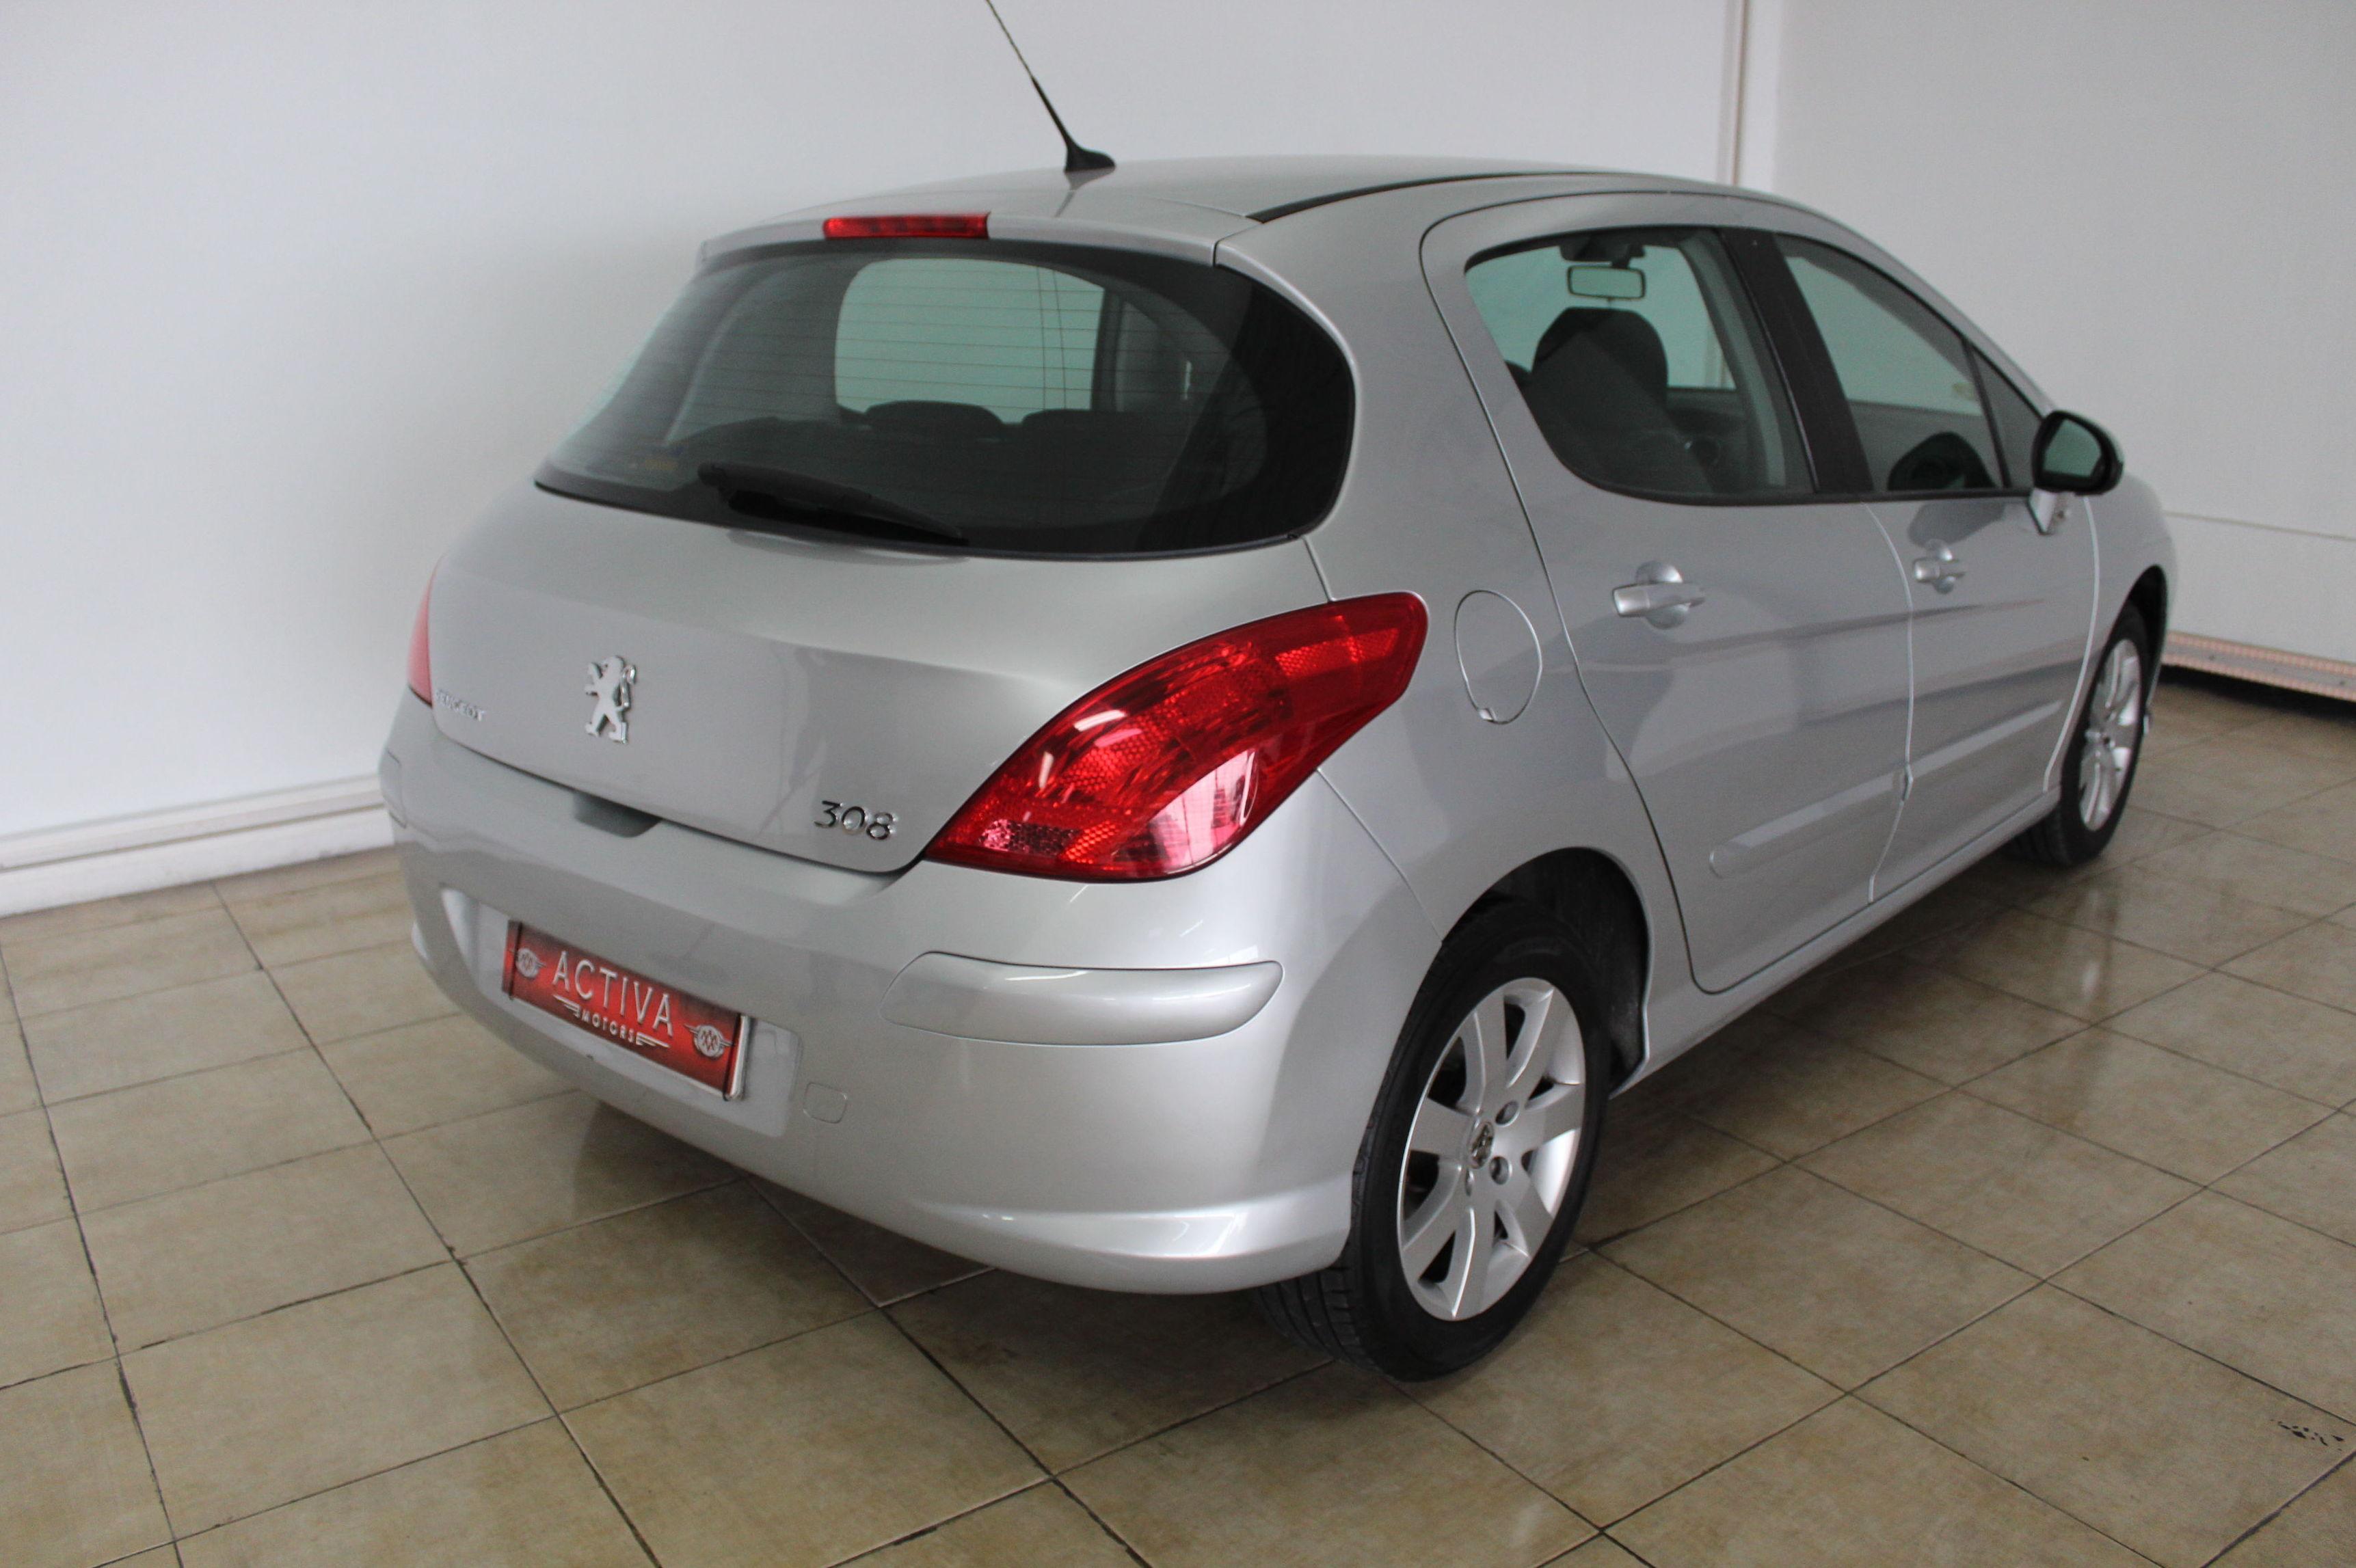 Peugeot 308 Sport 1 6 Hdi 110 Fap 5p   Nuestros Veh U00edculos